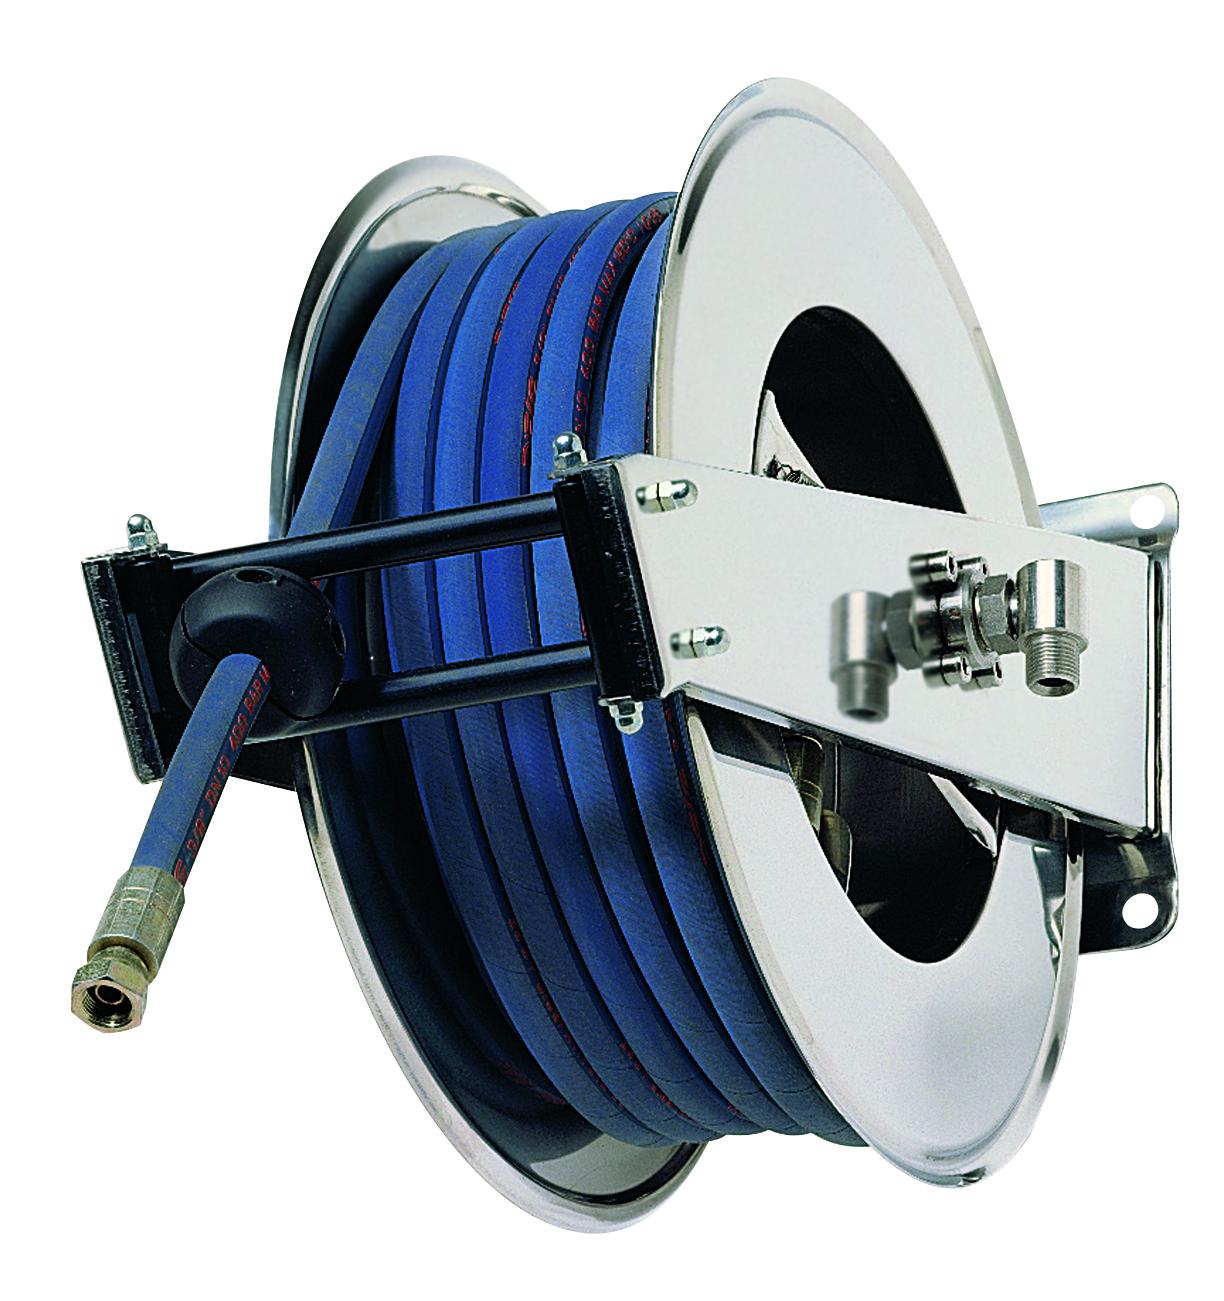 AV1500 - Hose reels per Acqua - Pressione Standard 0-200 BAR